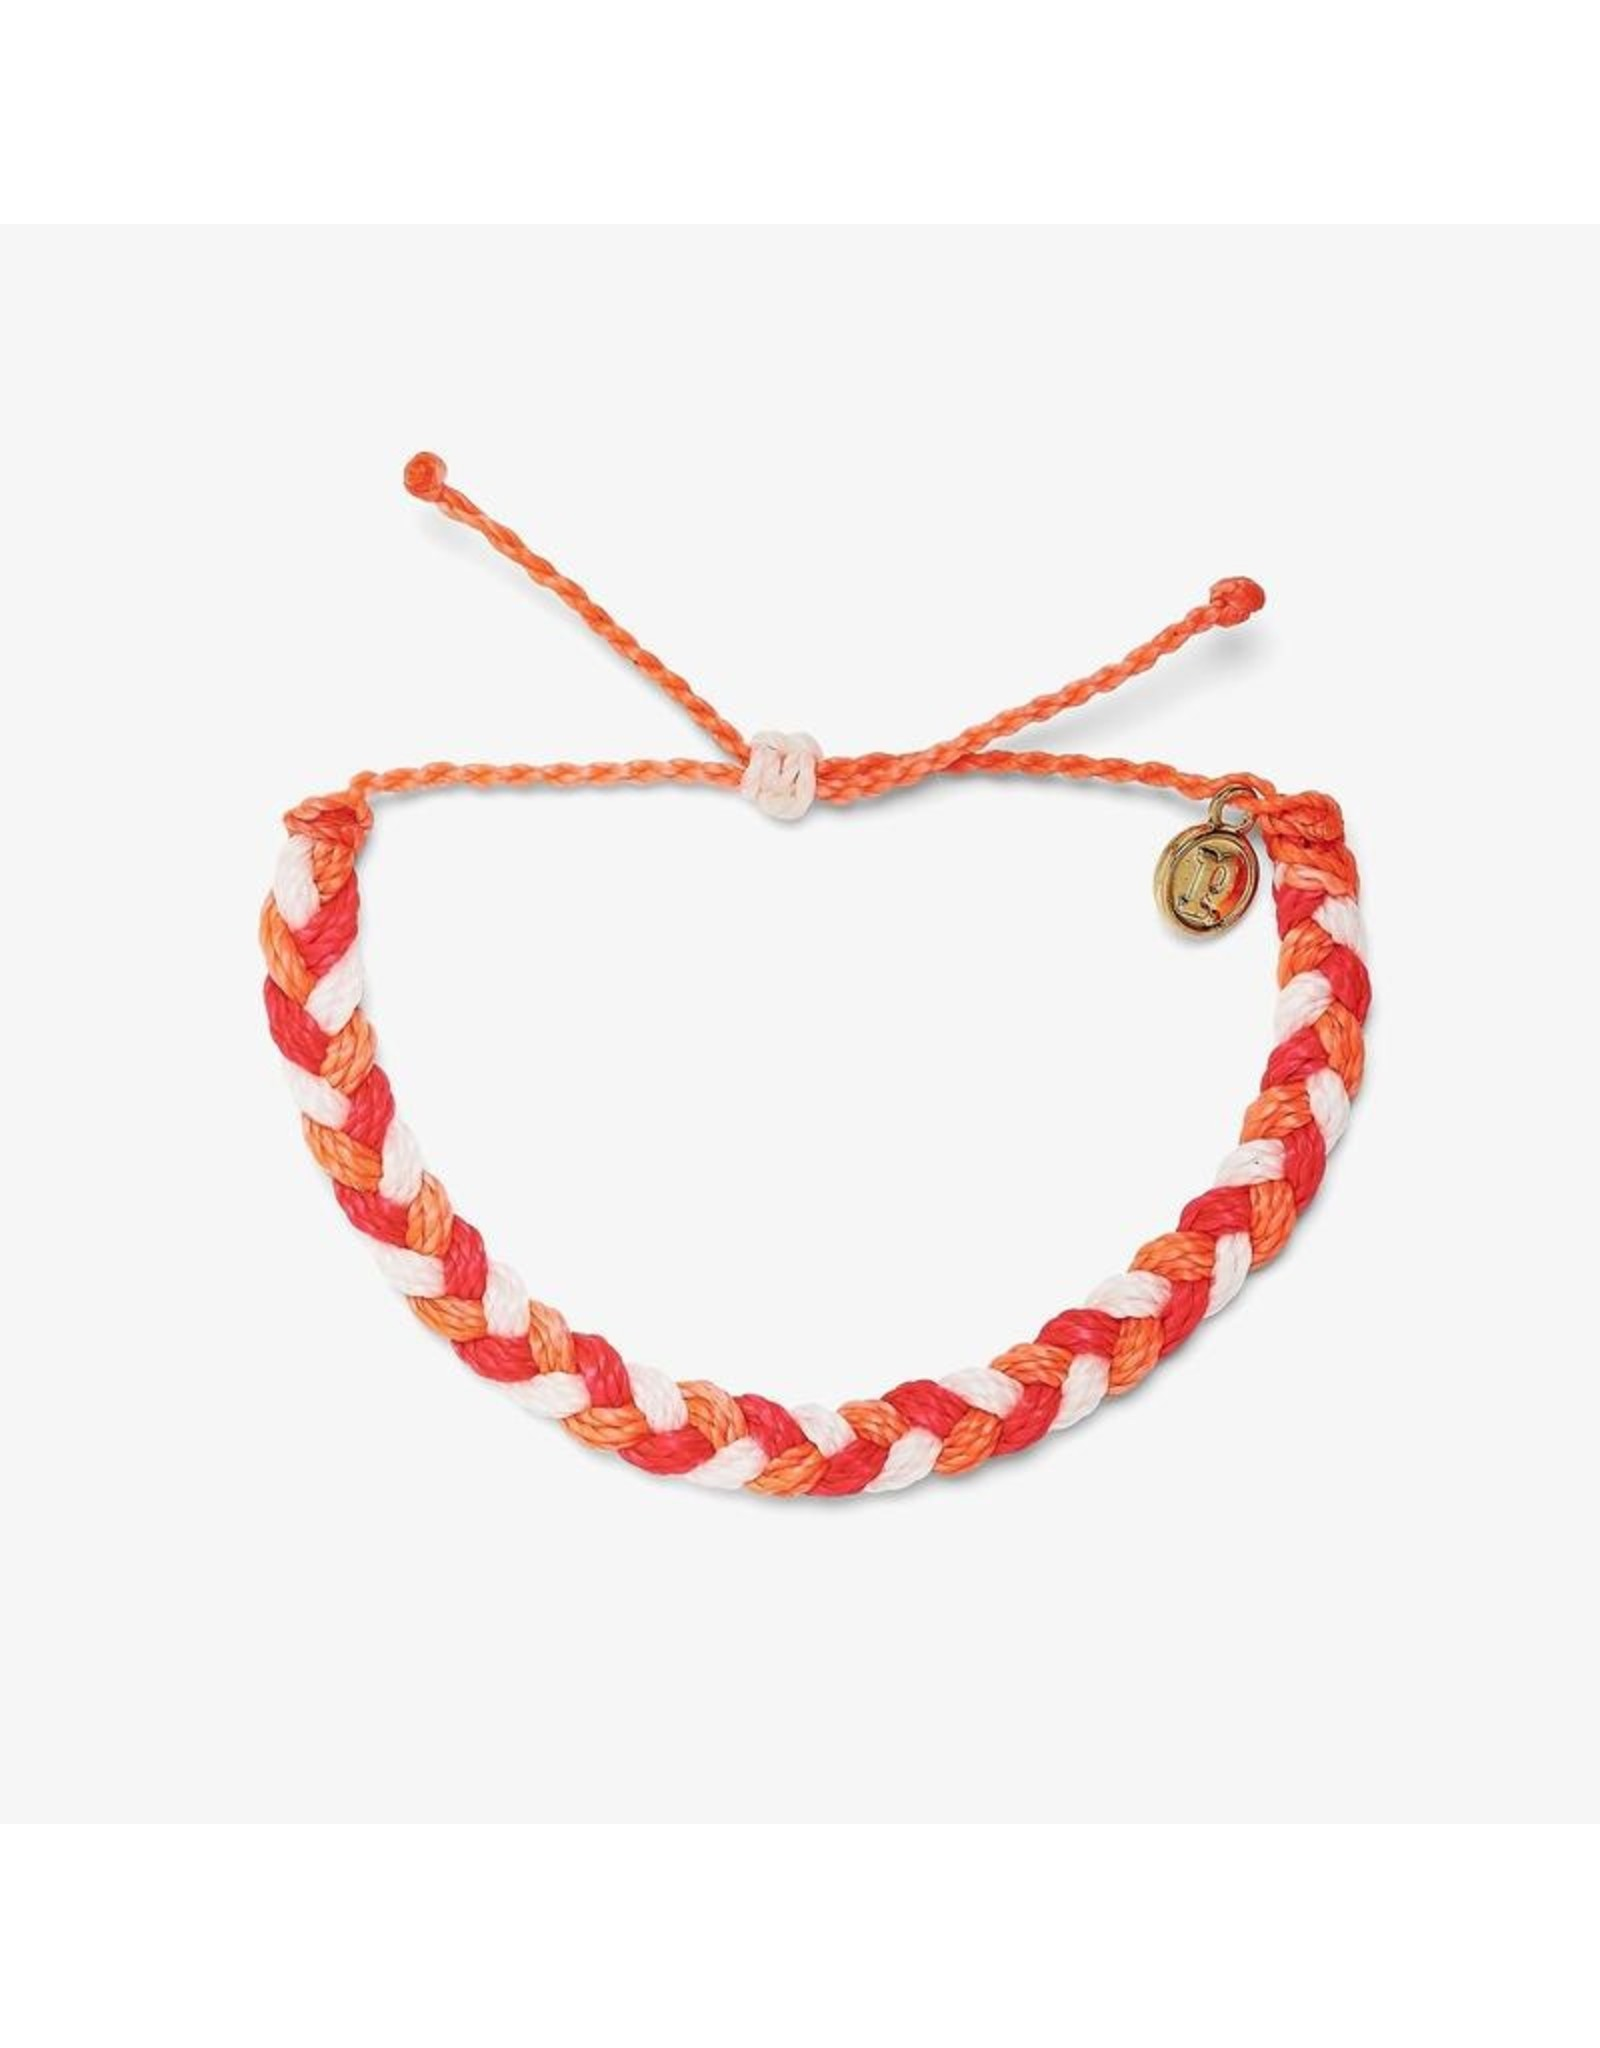 Pura Vida Braided Bracelet, Fruit Punch